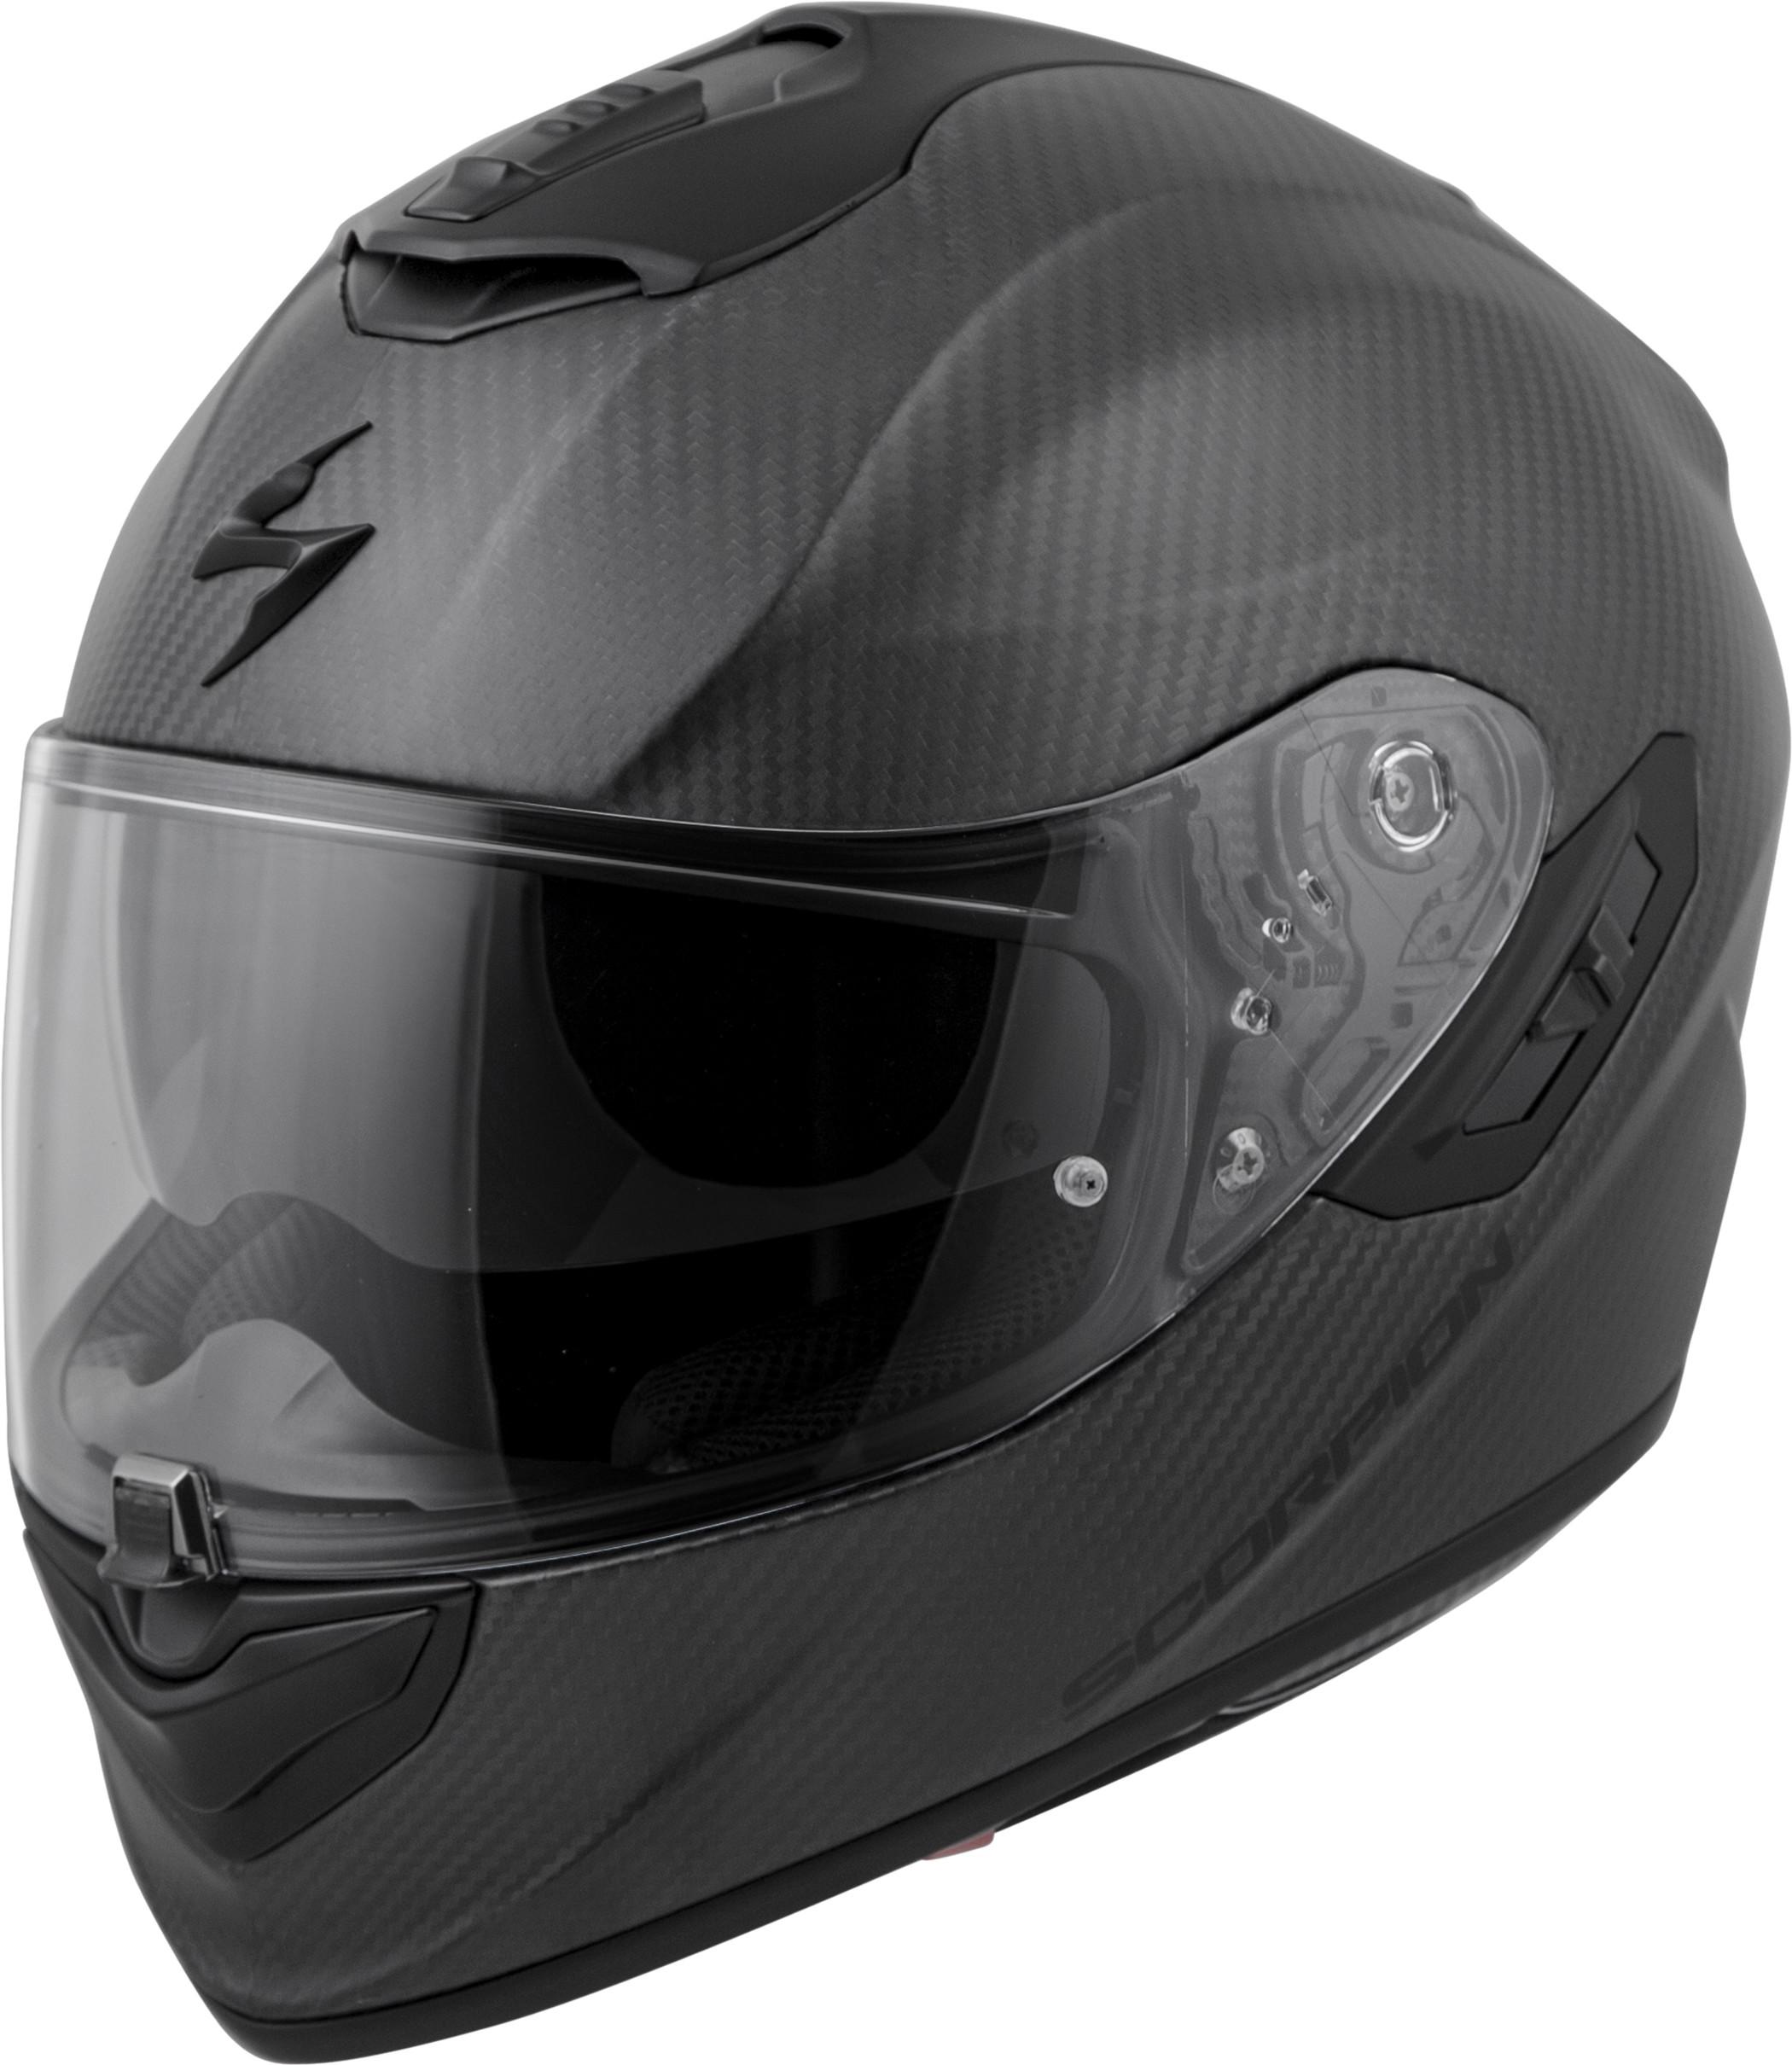 EXO-ST1400 CARBON Helmet Matte,  Black MD 75-1300M